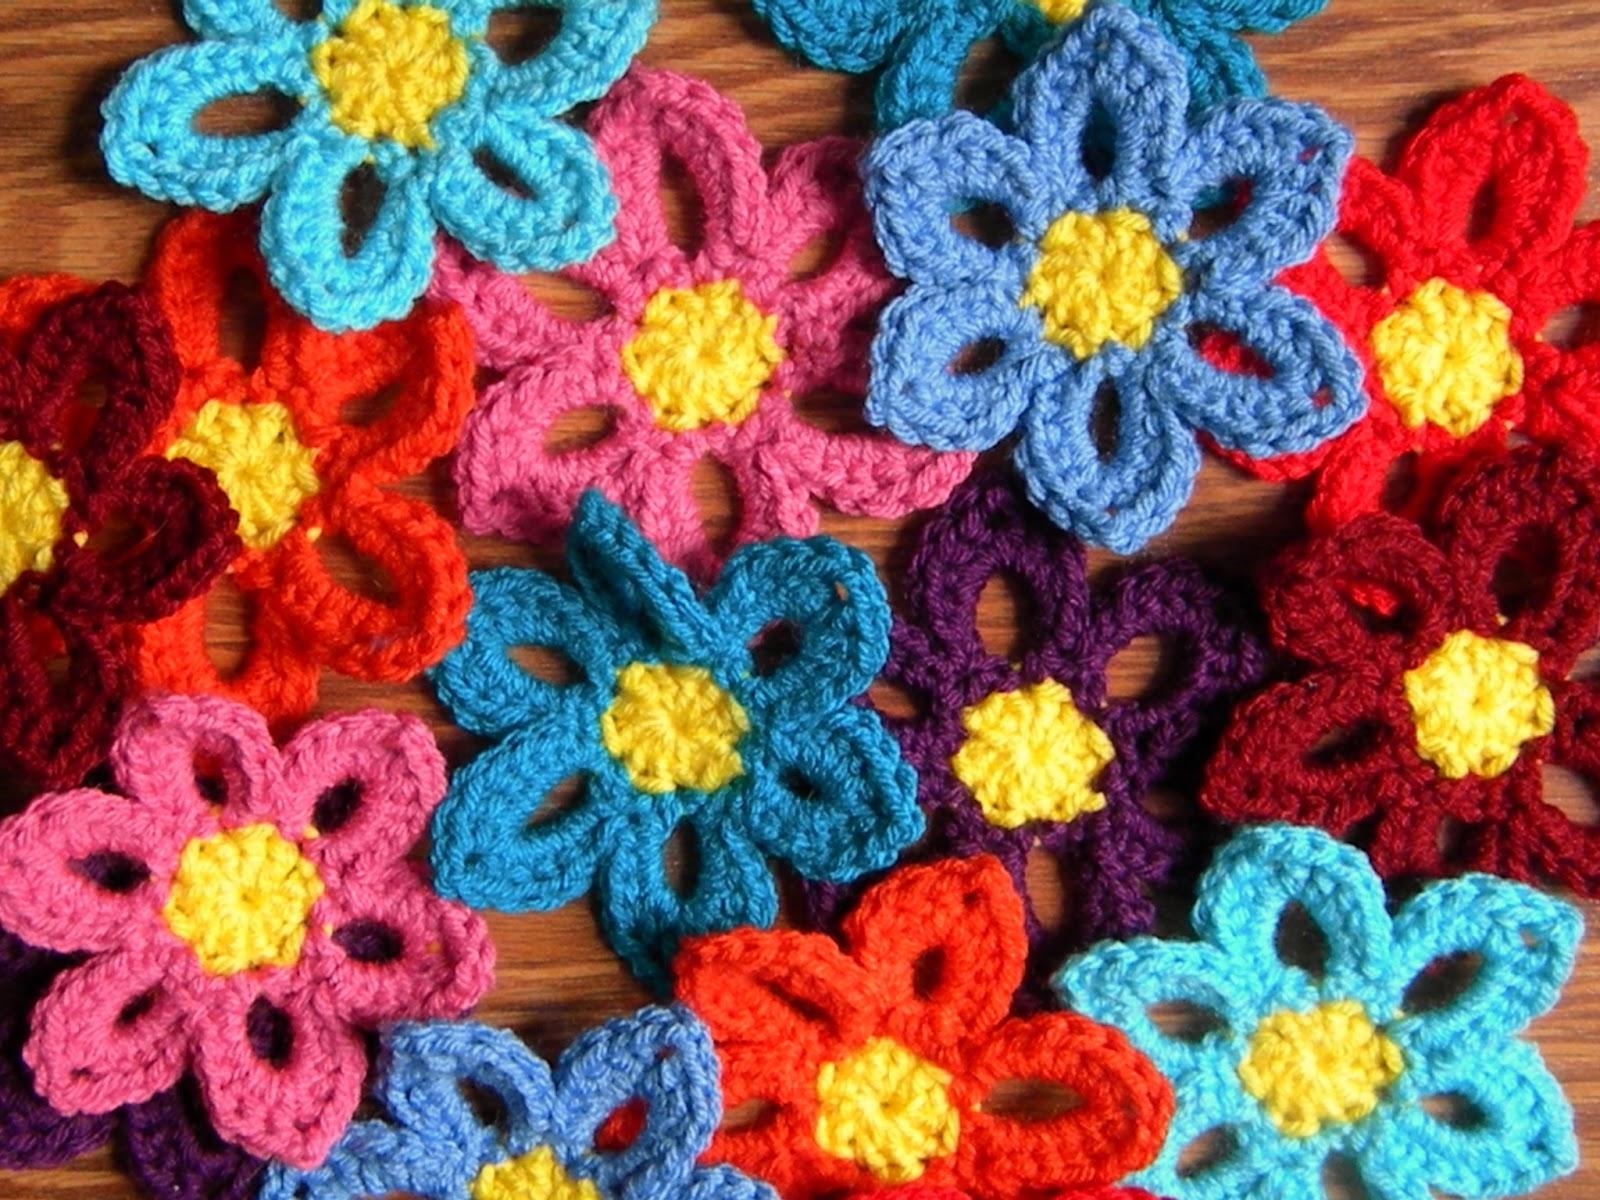 Crochet flower garland pattern manet for a hermits wish crochet spring flower garland pattern bankloansurffo Images